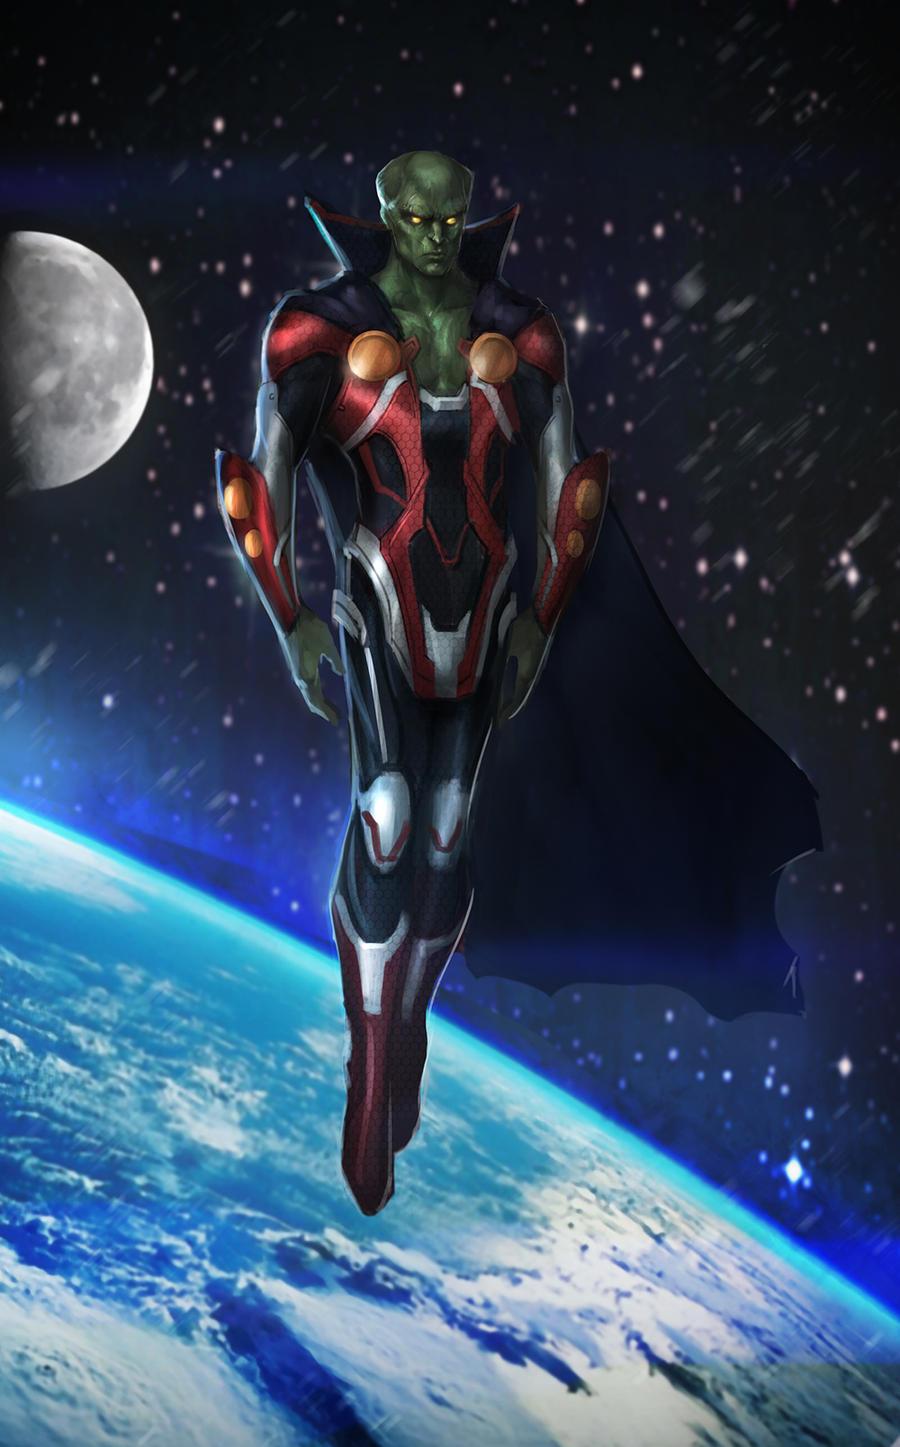 [Mission JL] Qward Attacks! [B-C-F-S] Martian_manhunter_redesign_by_t_biddy-d5a8fek